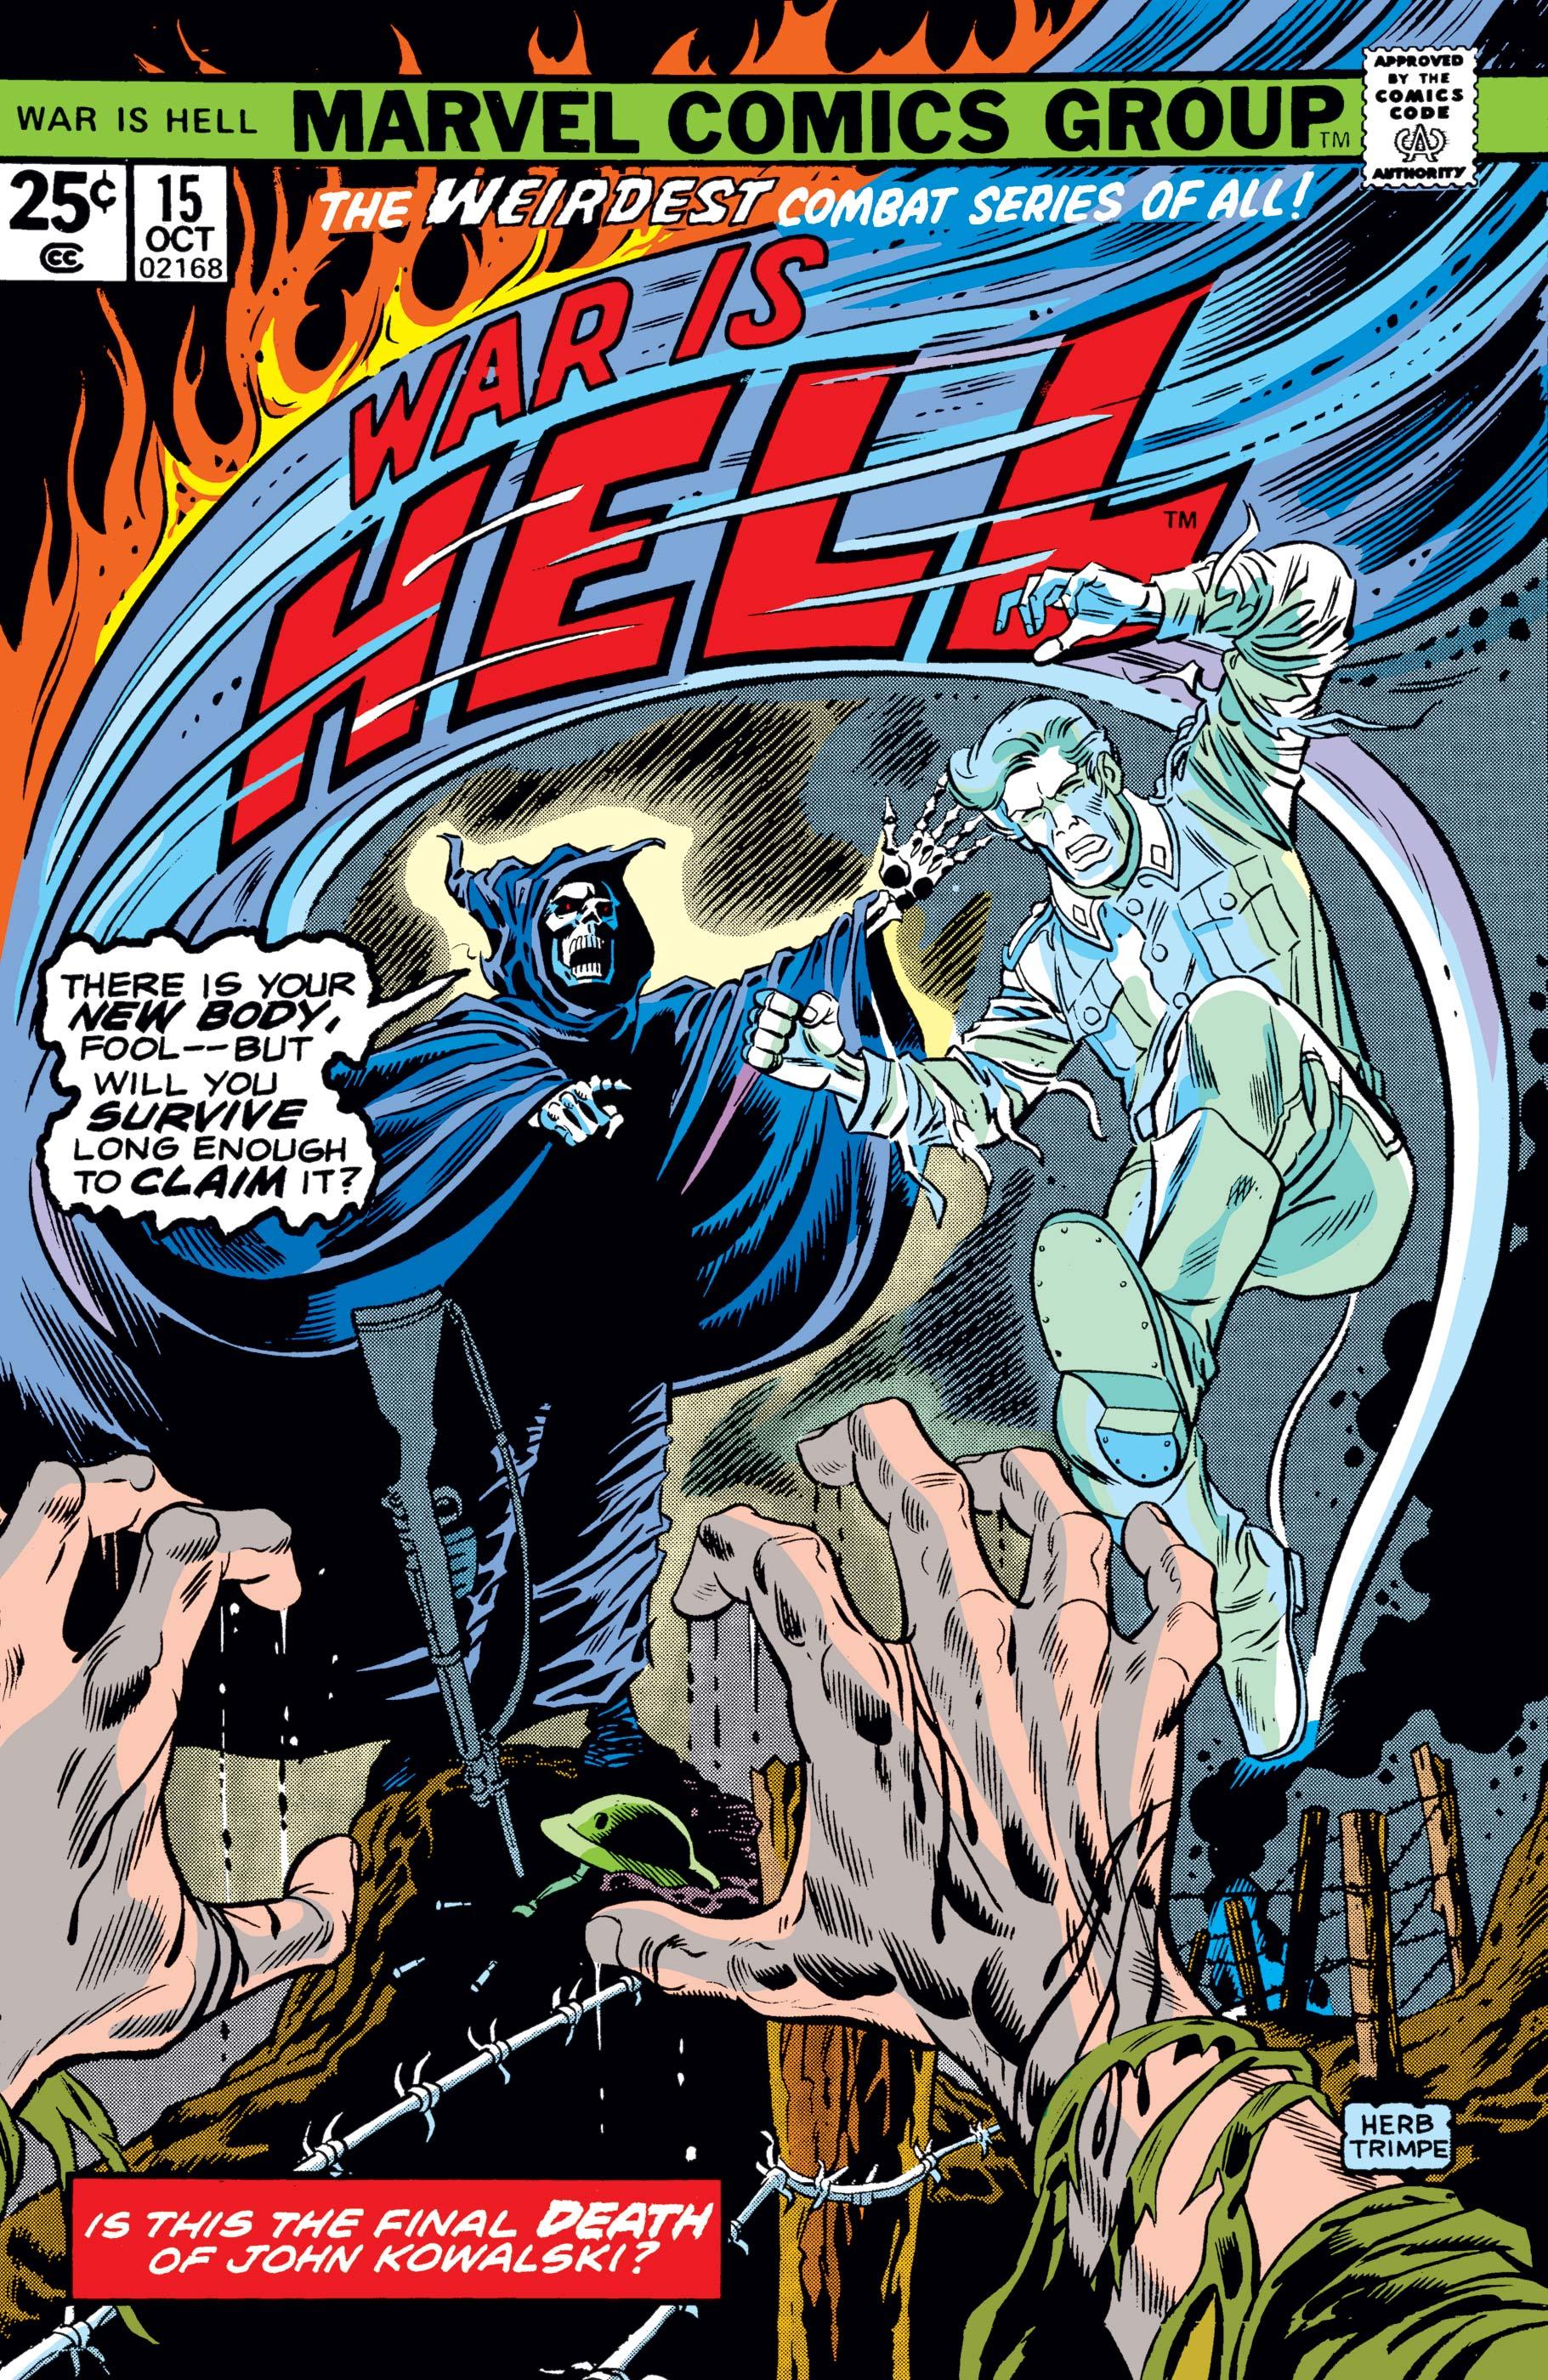 War Is Hell (1973) #15